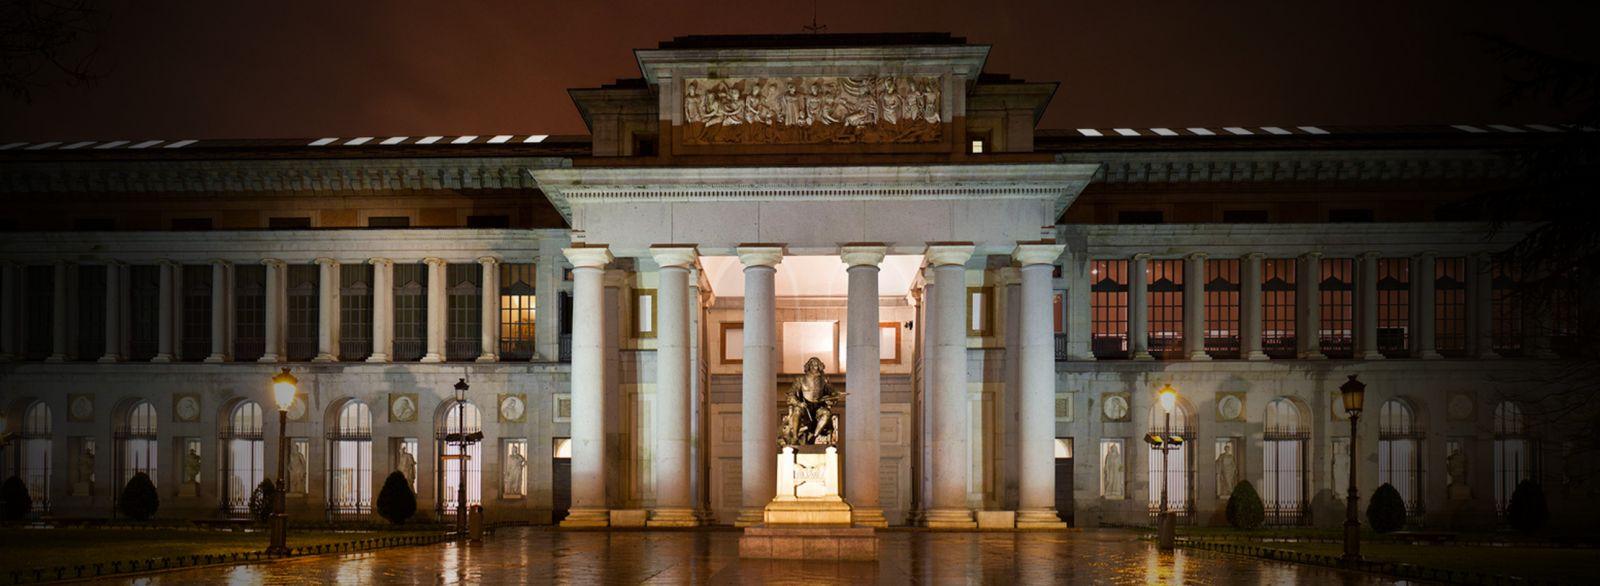 The Prado Museum</br> temporarily closed to public access